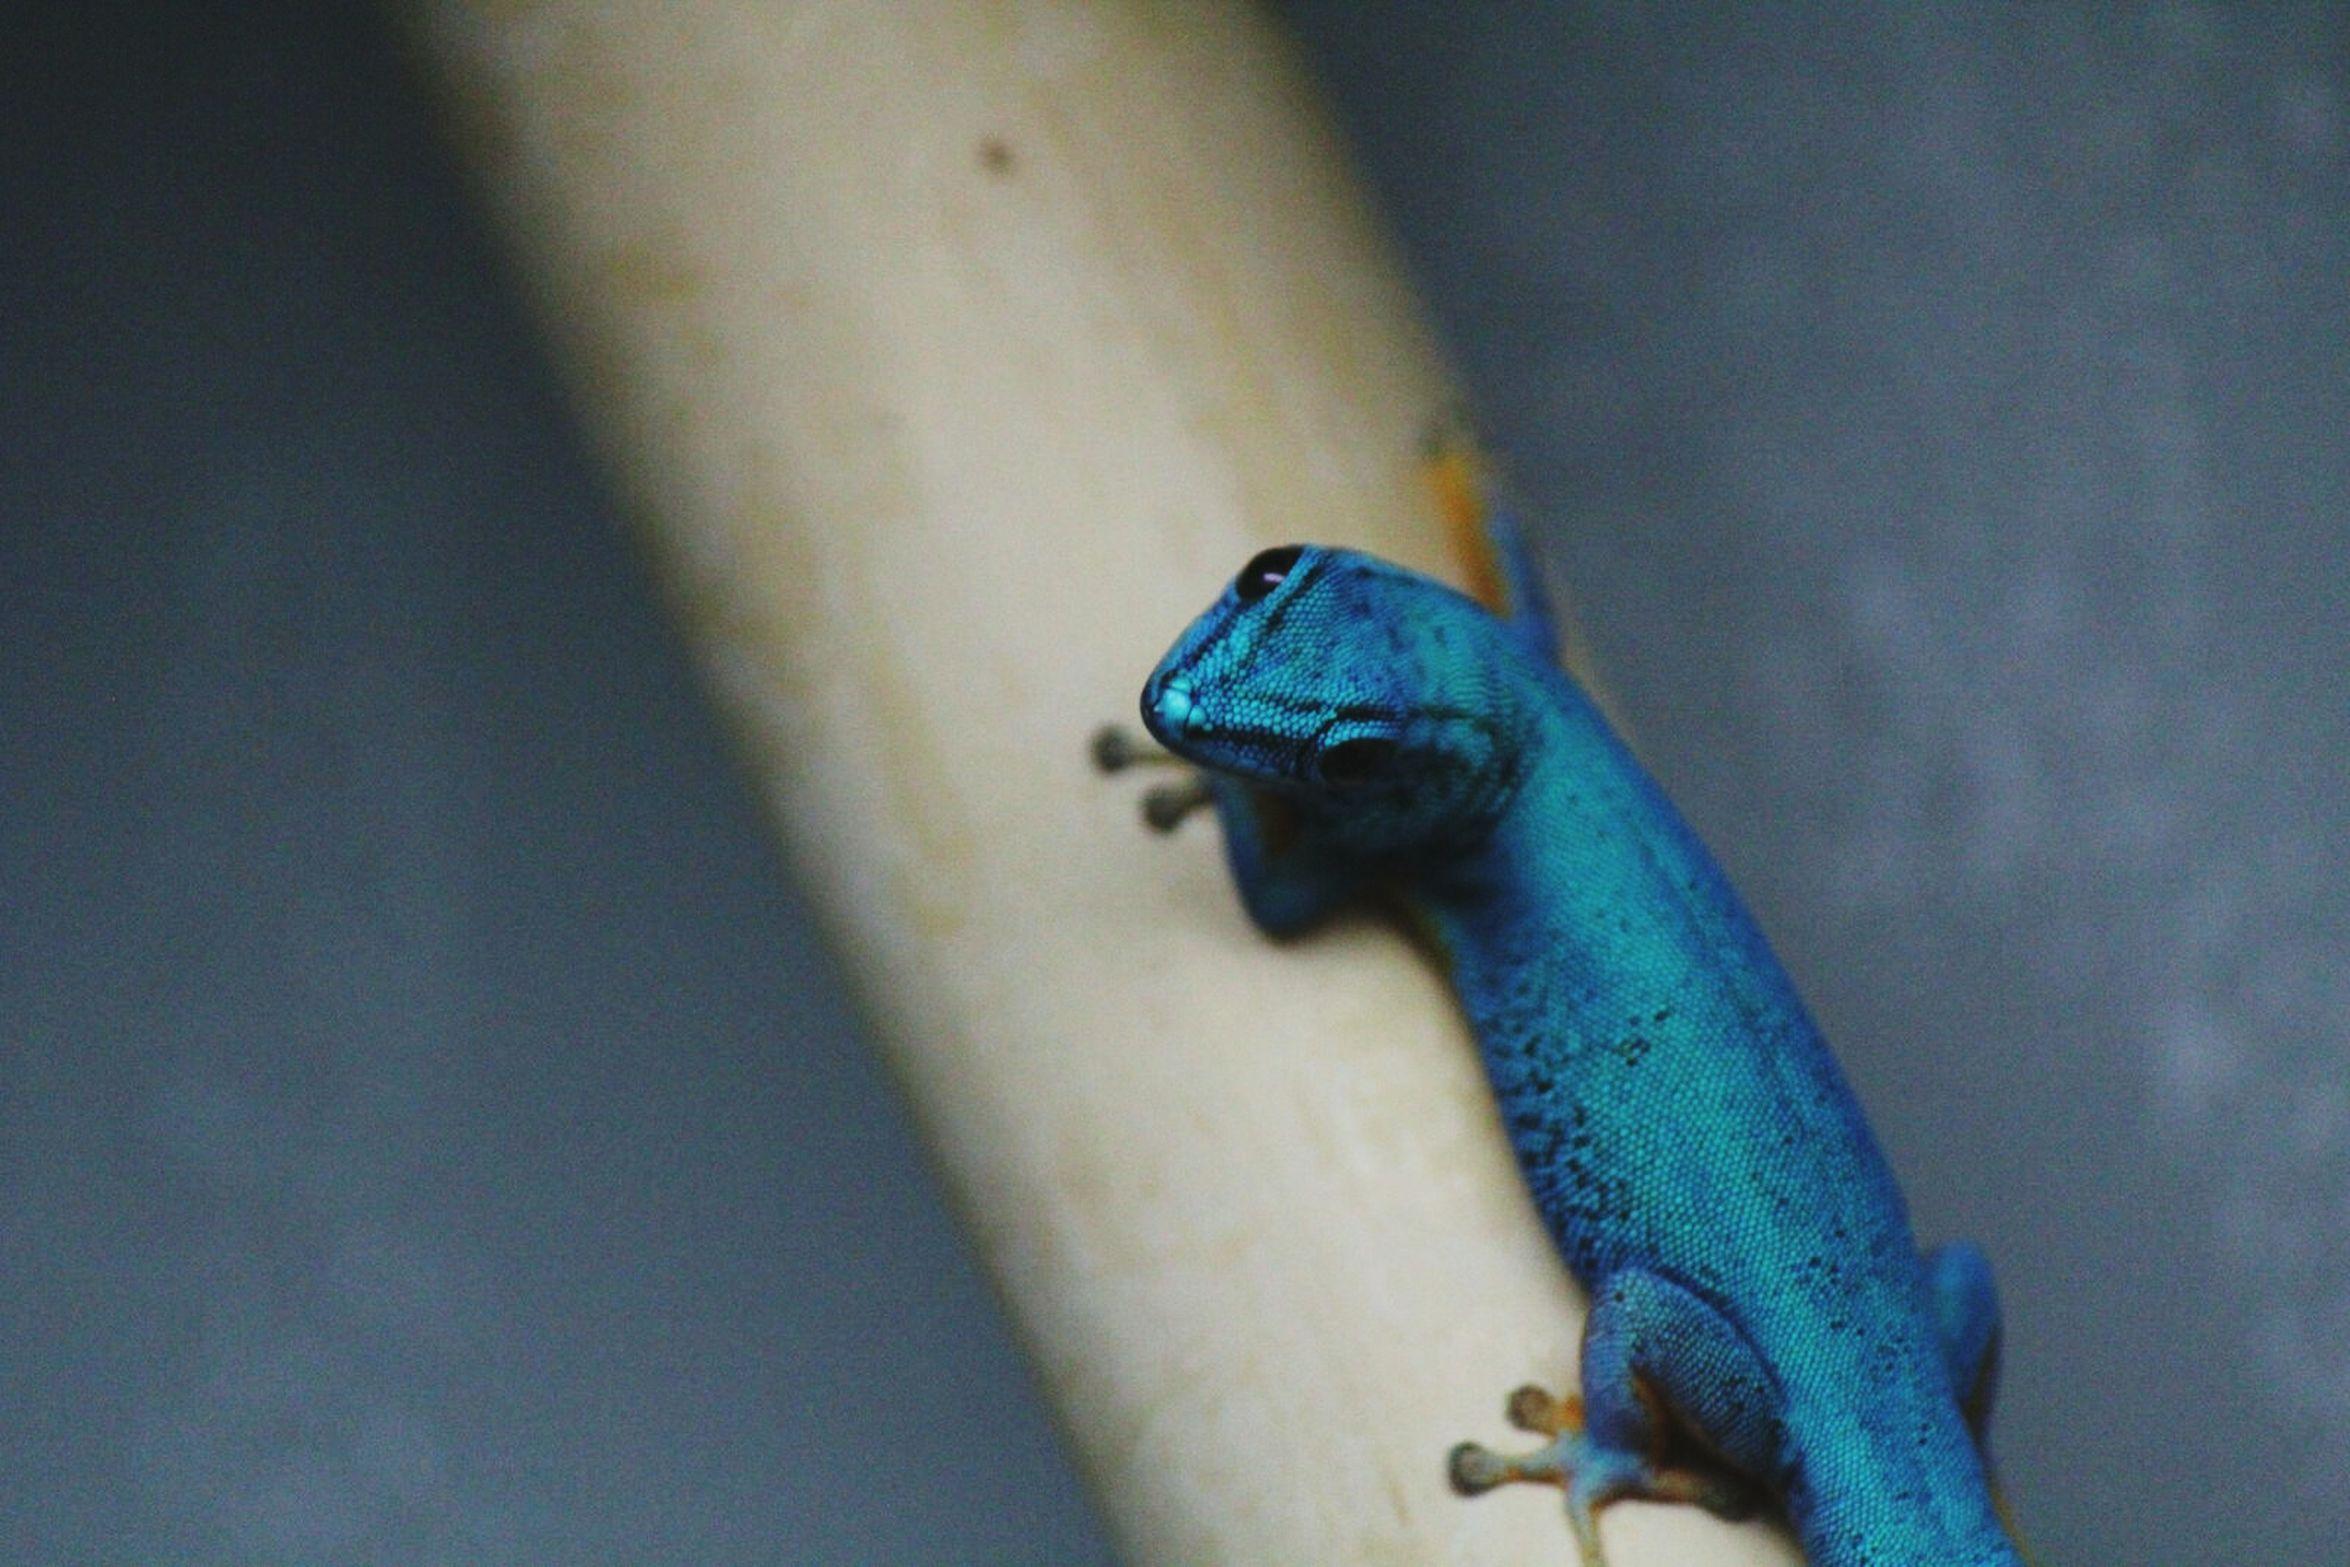 Blue Lizard Wilhelma Reptile Beautiful Animal